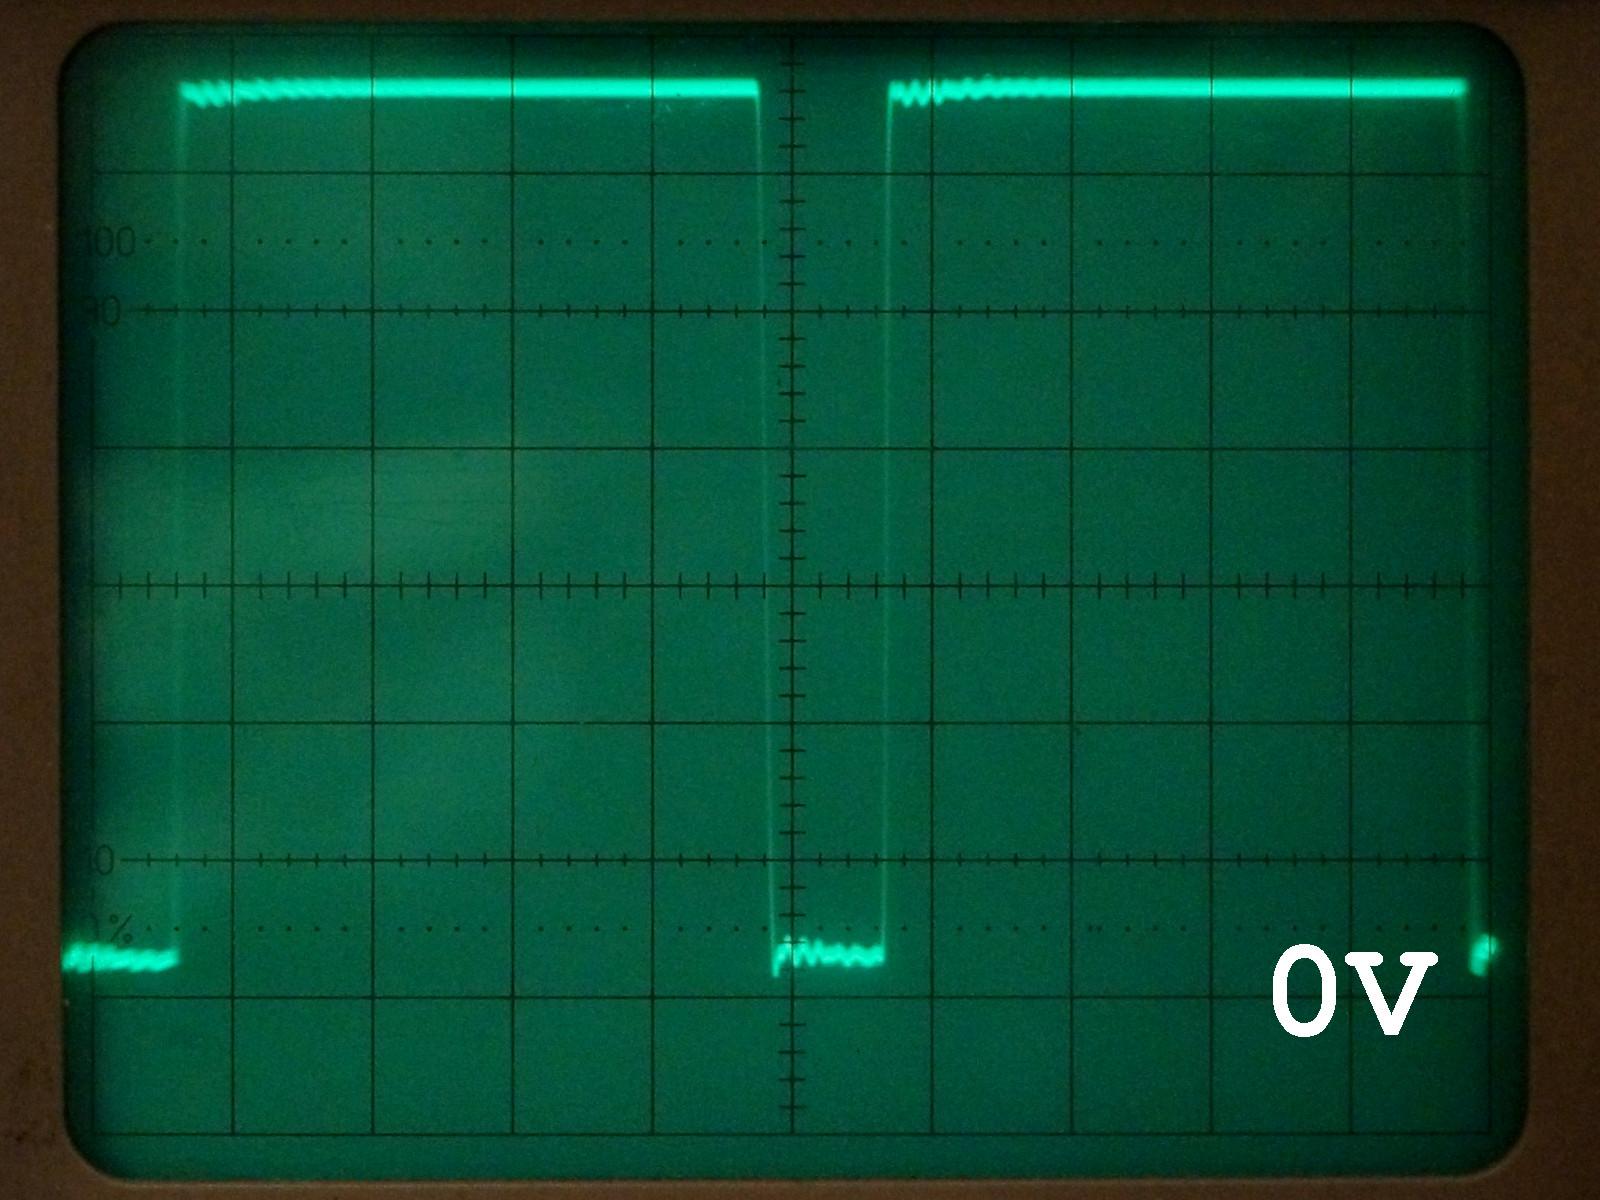 sensors_final-circuit-post-R1-inductor-disconnected.jpg